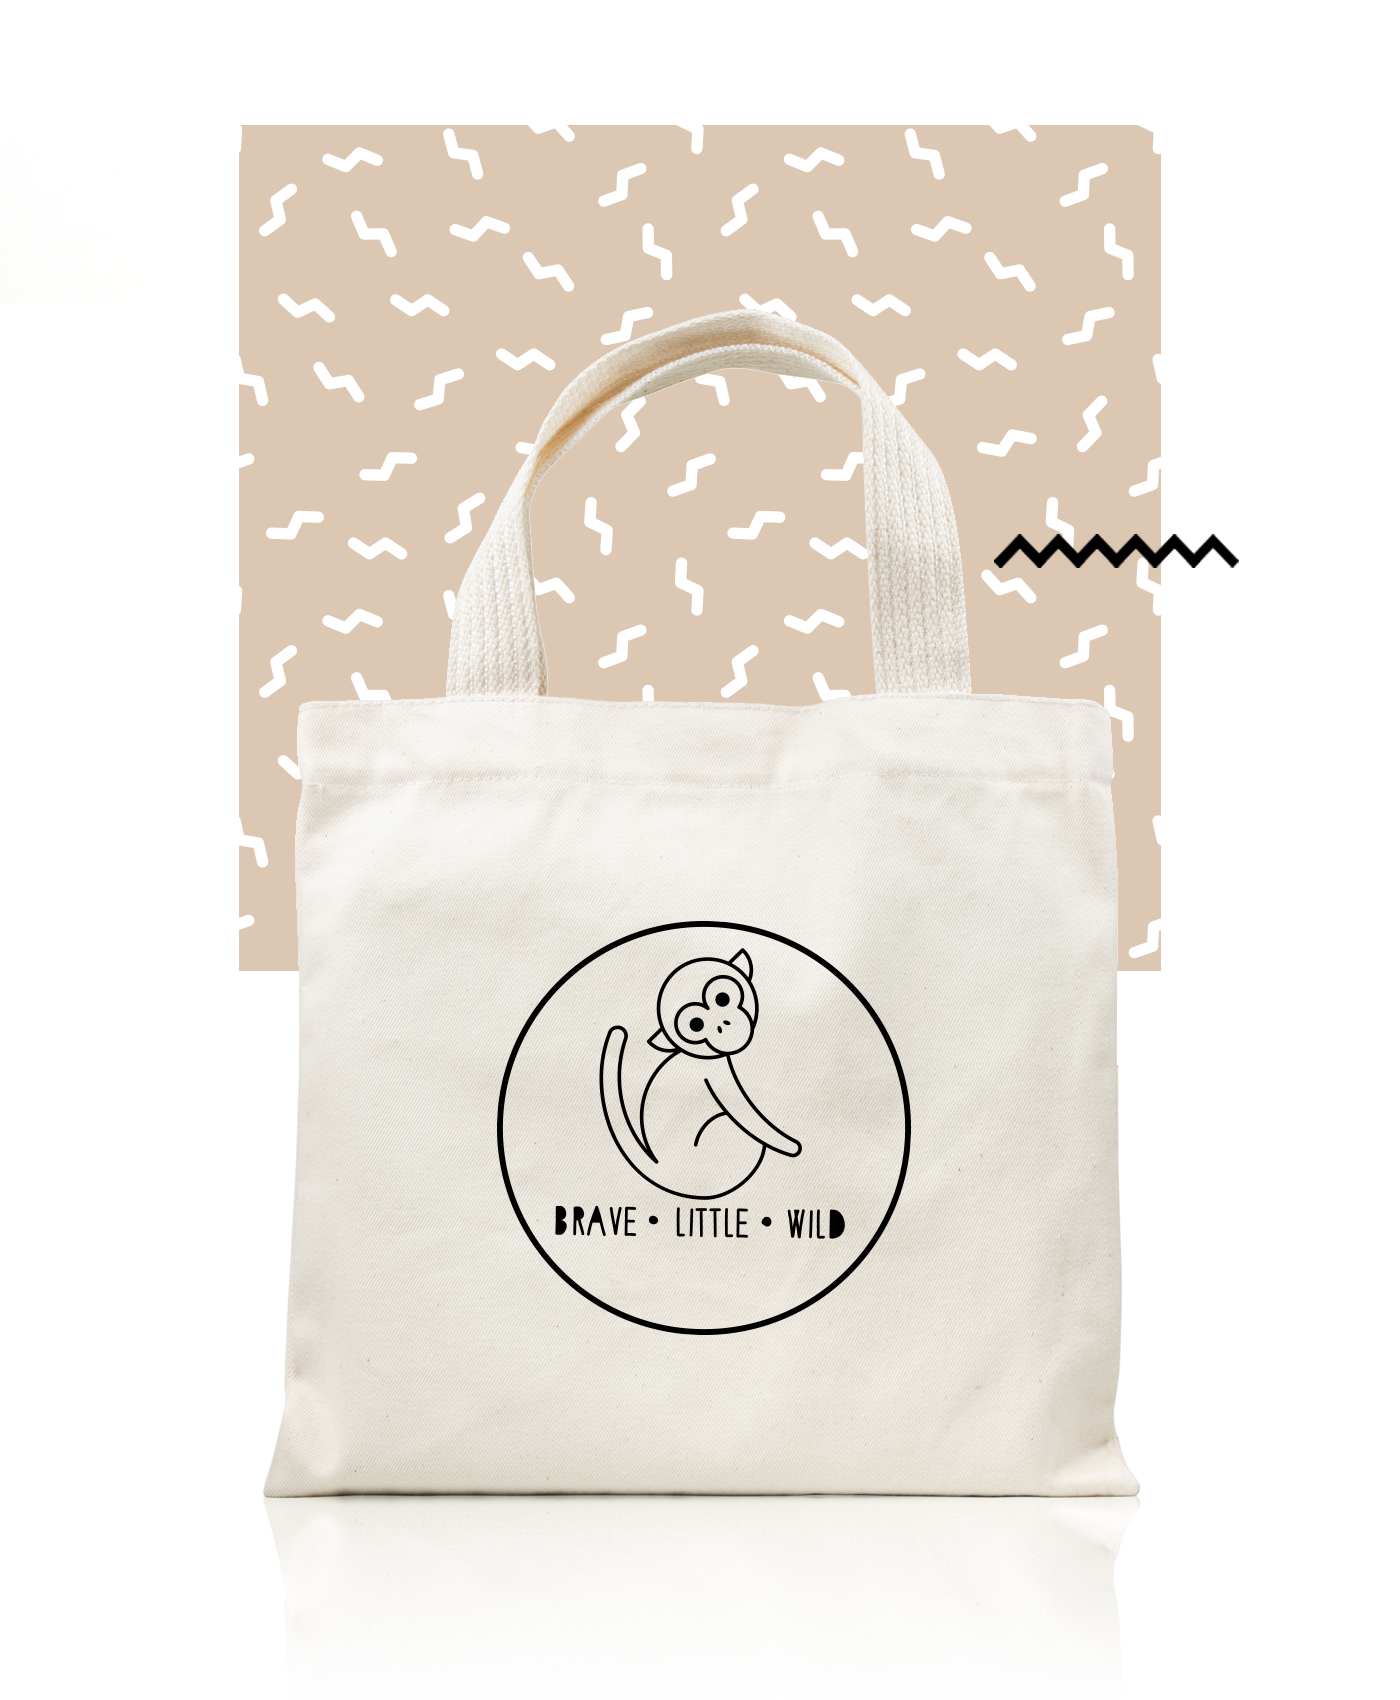 kids design clothing brand Fashion  pattern textile print art direction  branding  graphic design